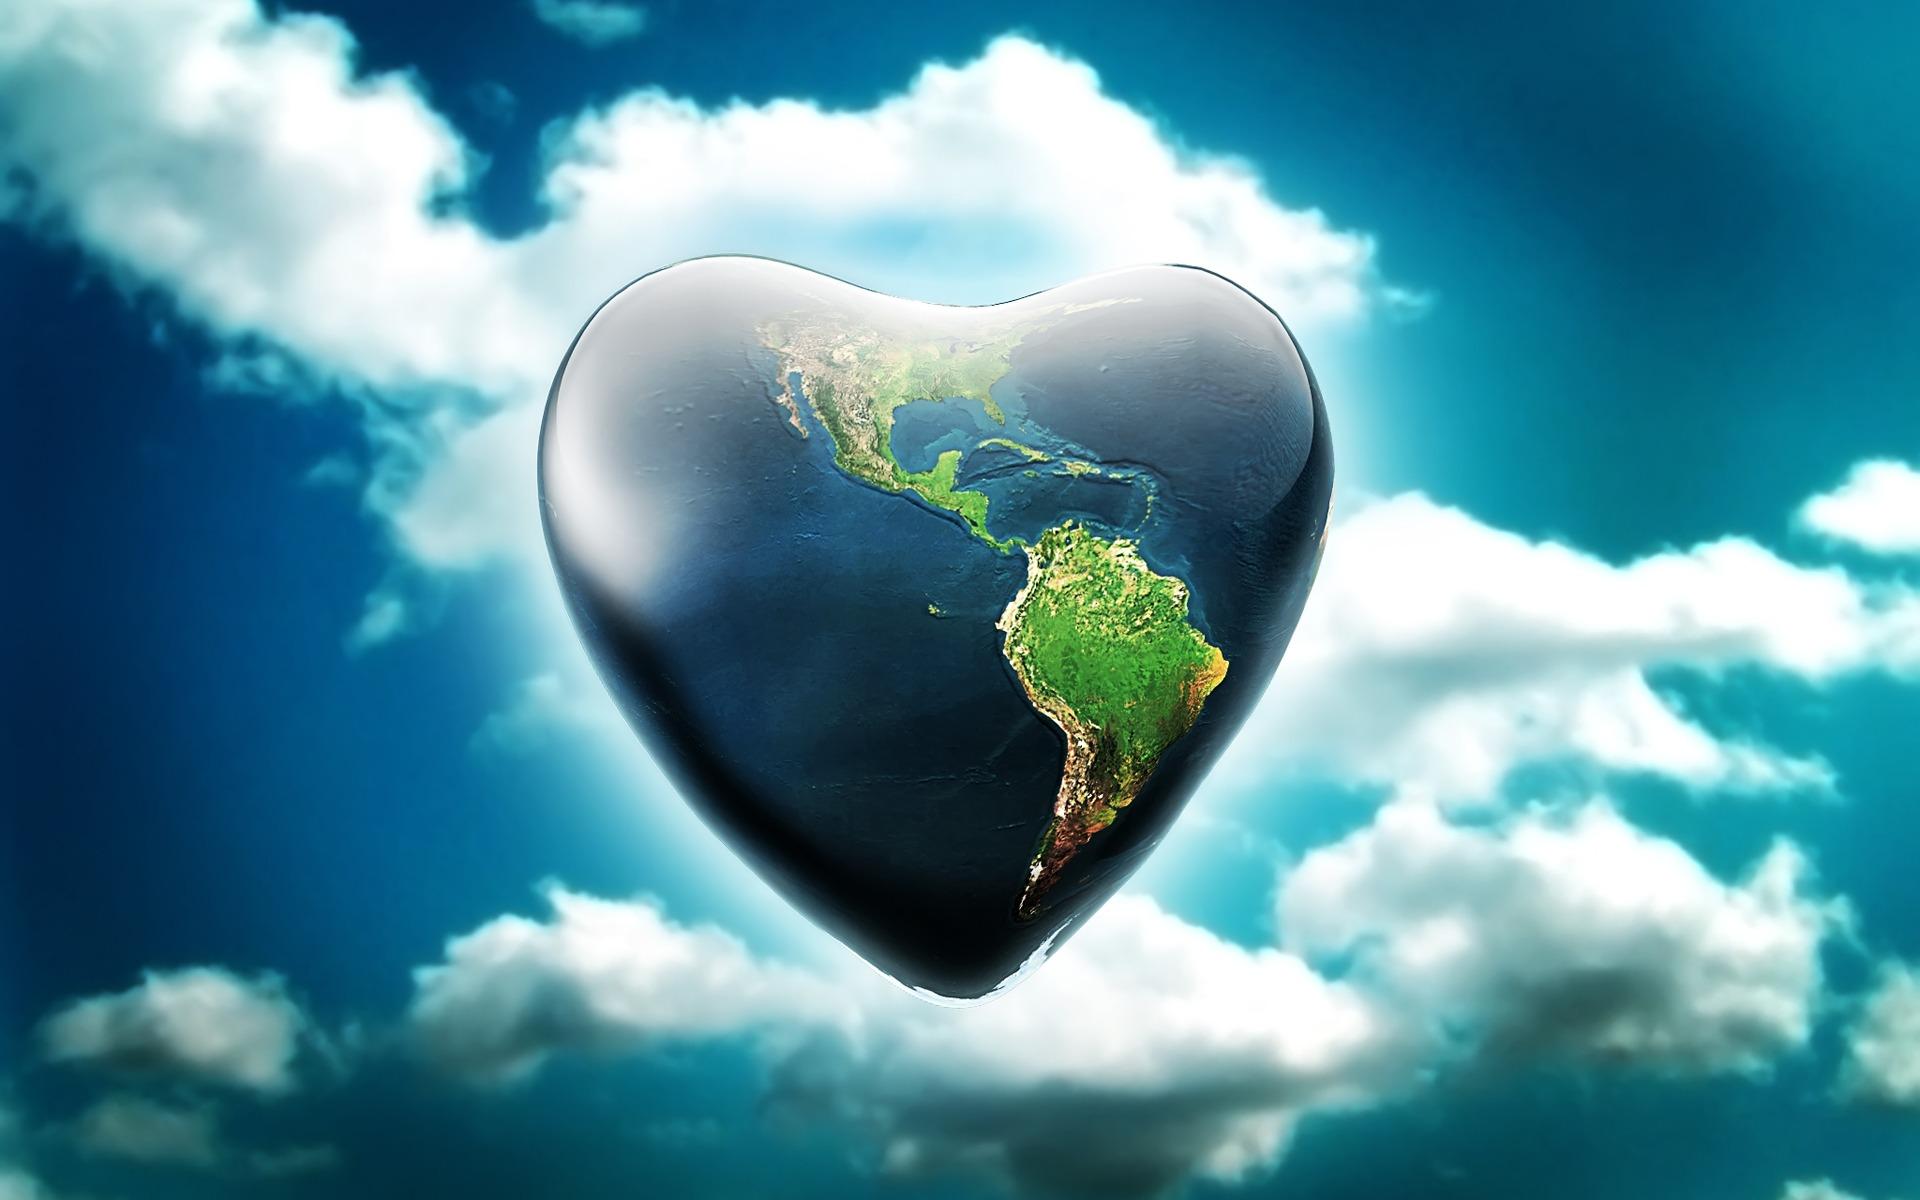 Earth Heart Wallpaper Abstract 3d Wallpapers In Jpg Format